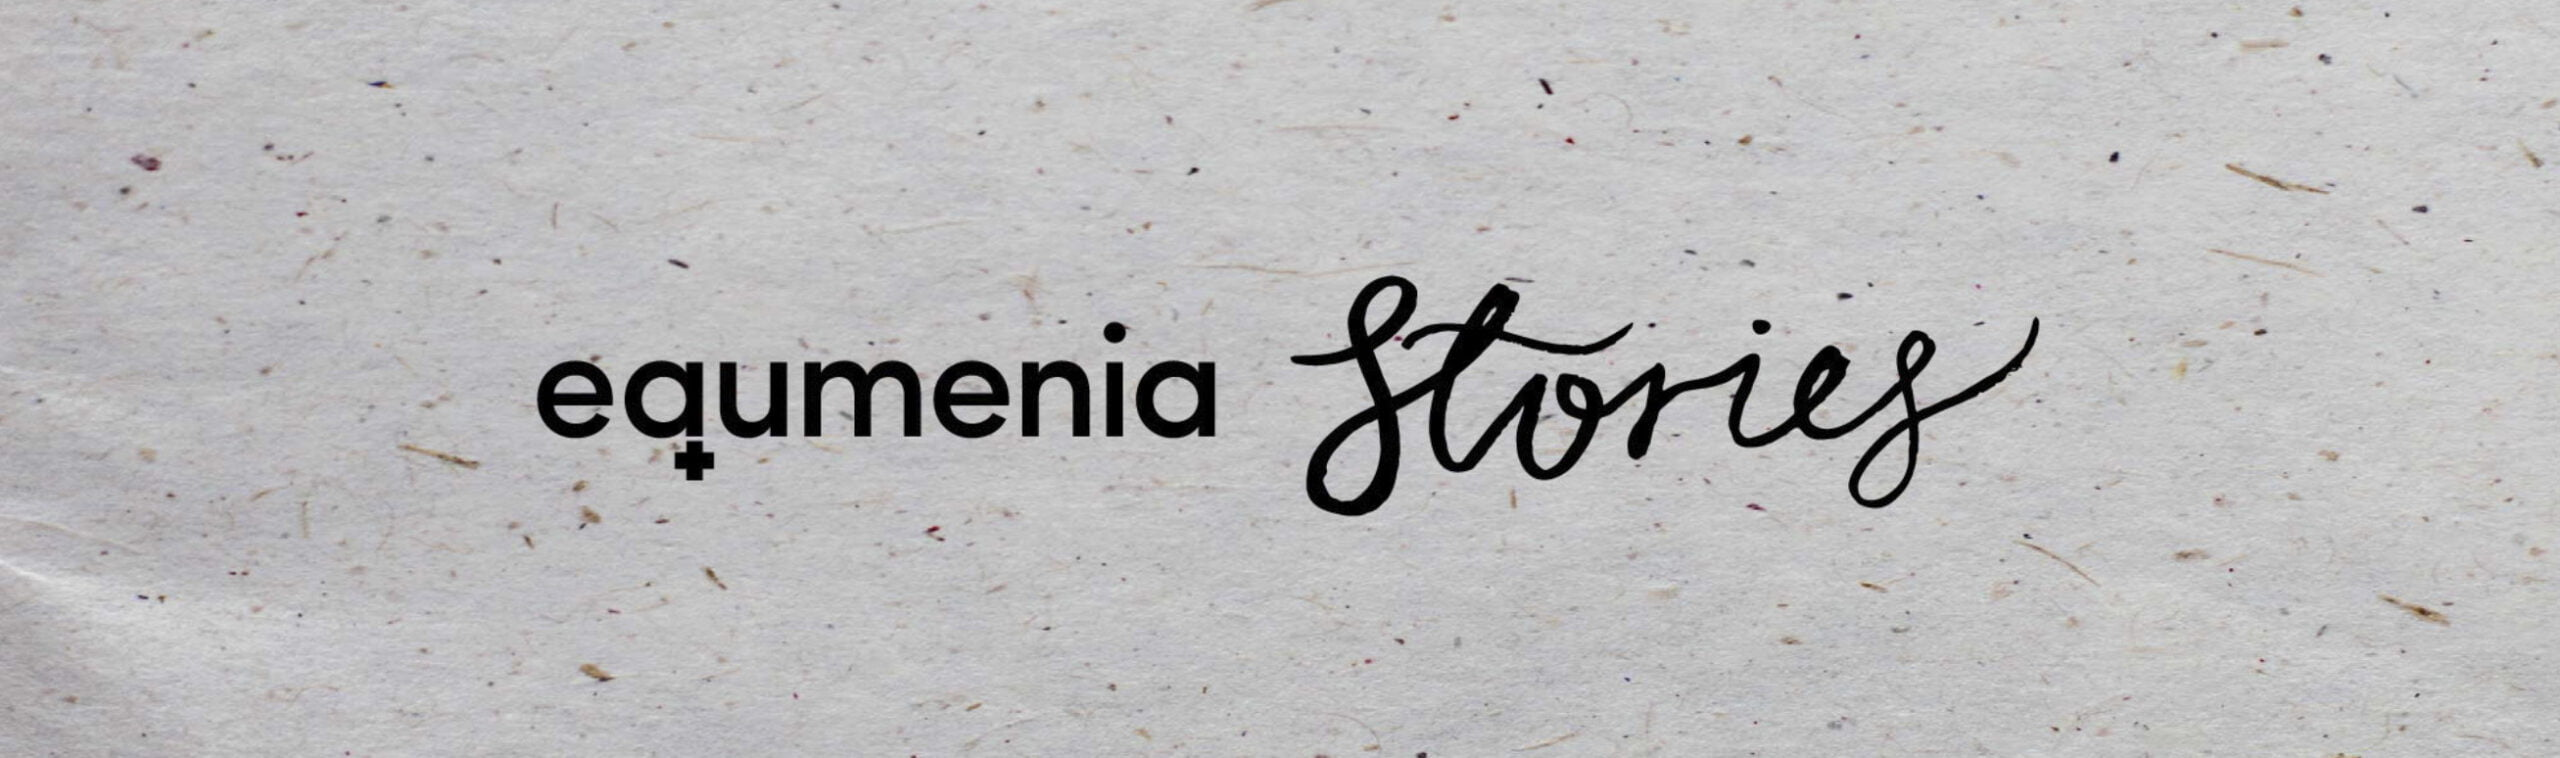 rubrik Equmenia stories